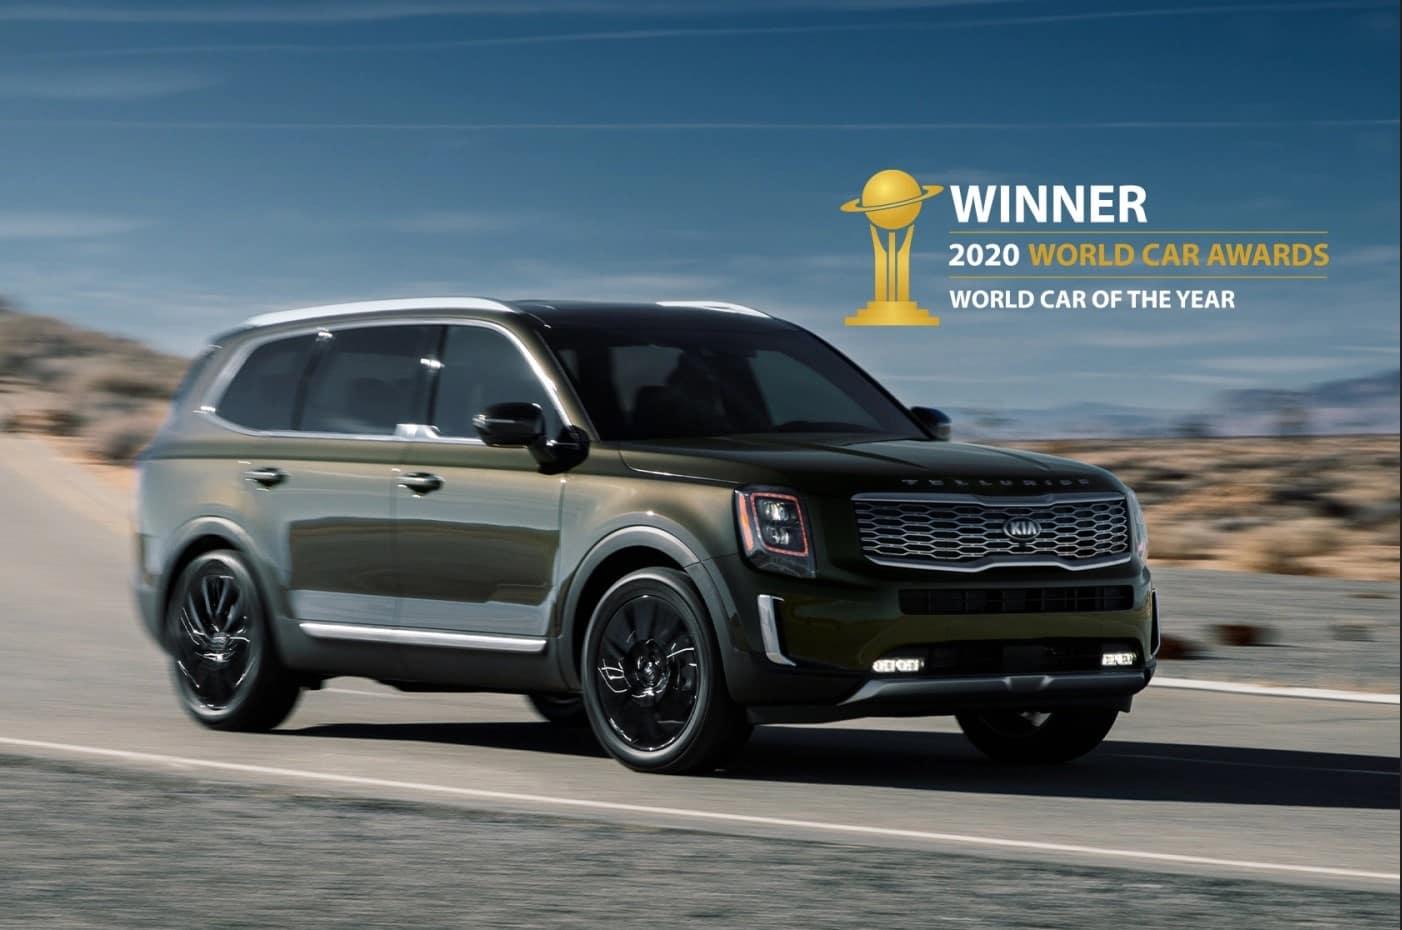 Kia Telluride winner of the 2020 World Car Awards World Car of the Year